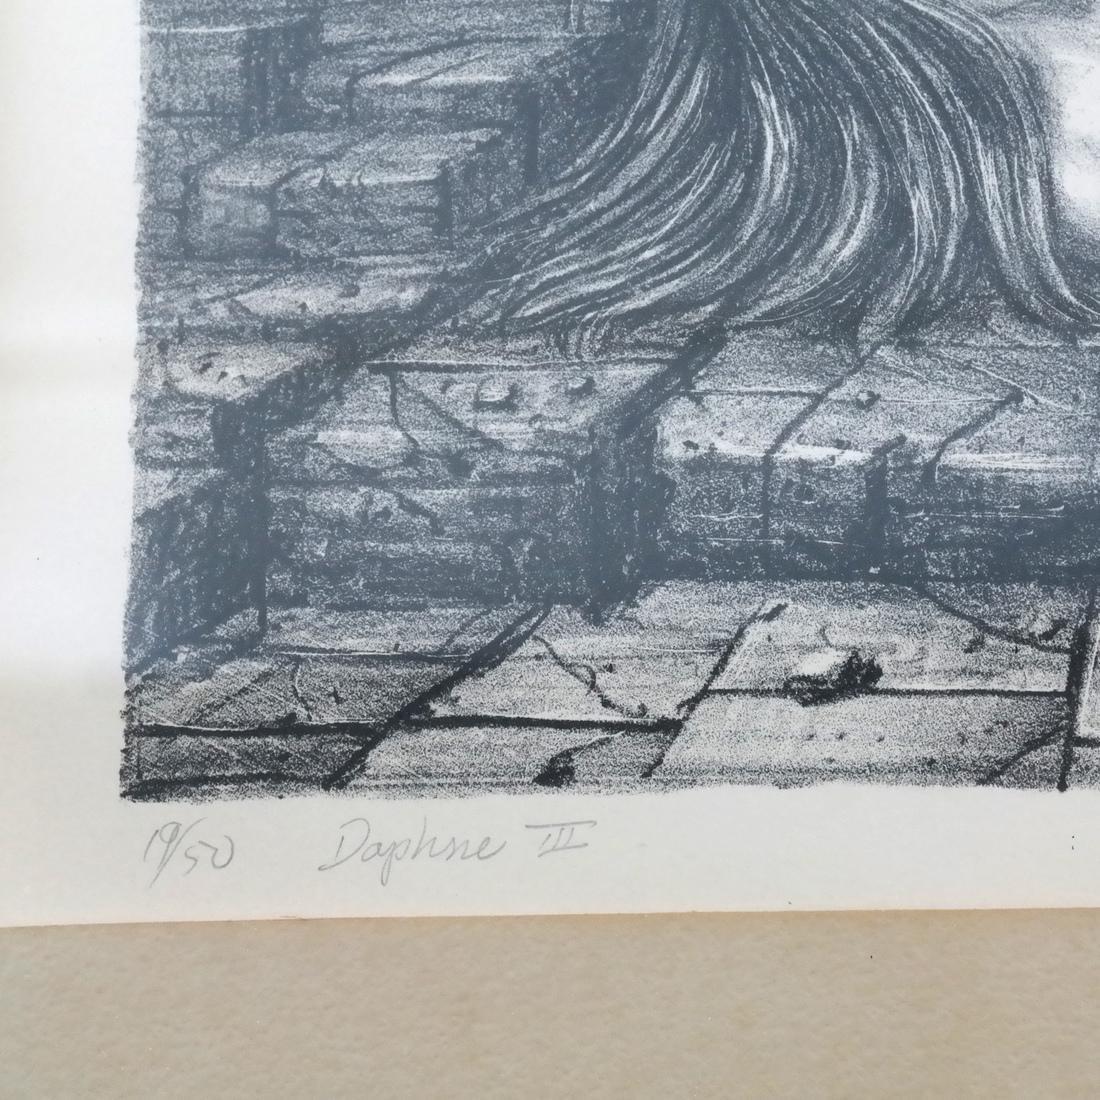 "Raymond Whyte ""Daphne III"" Lithograph - 4"